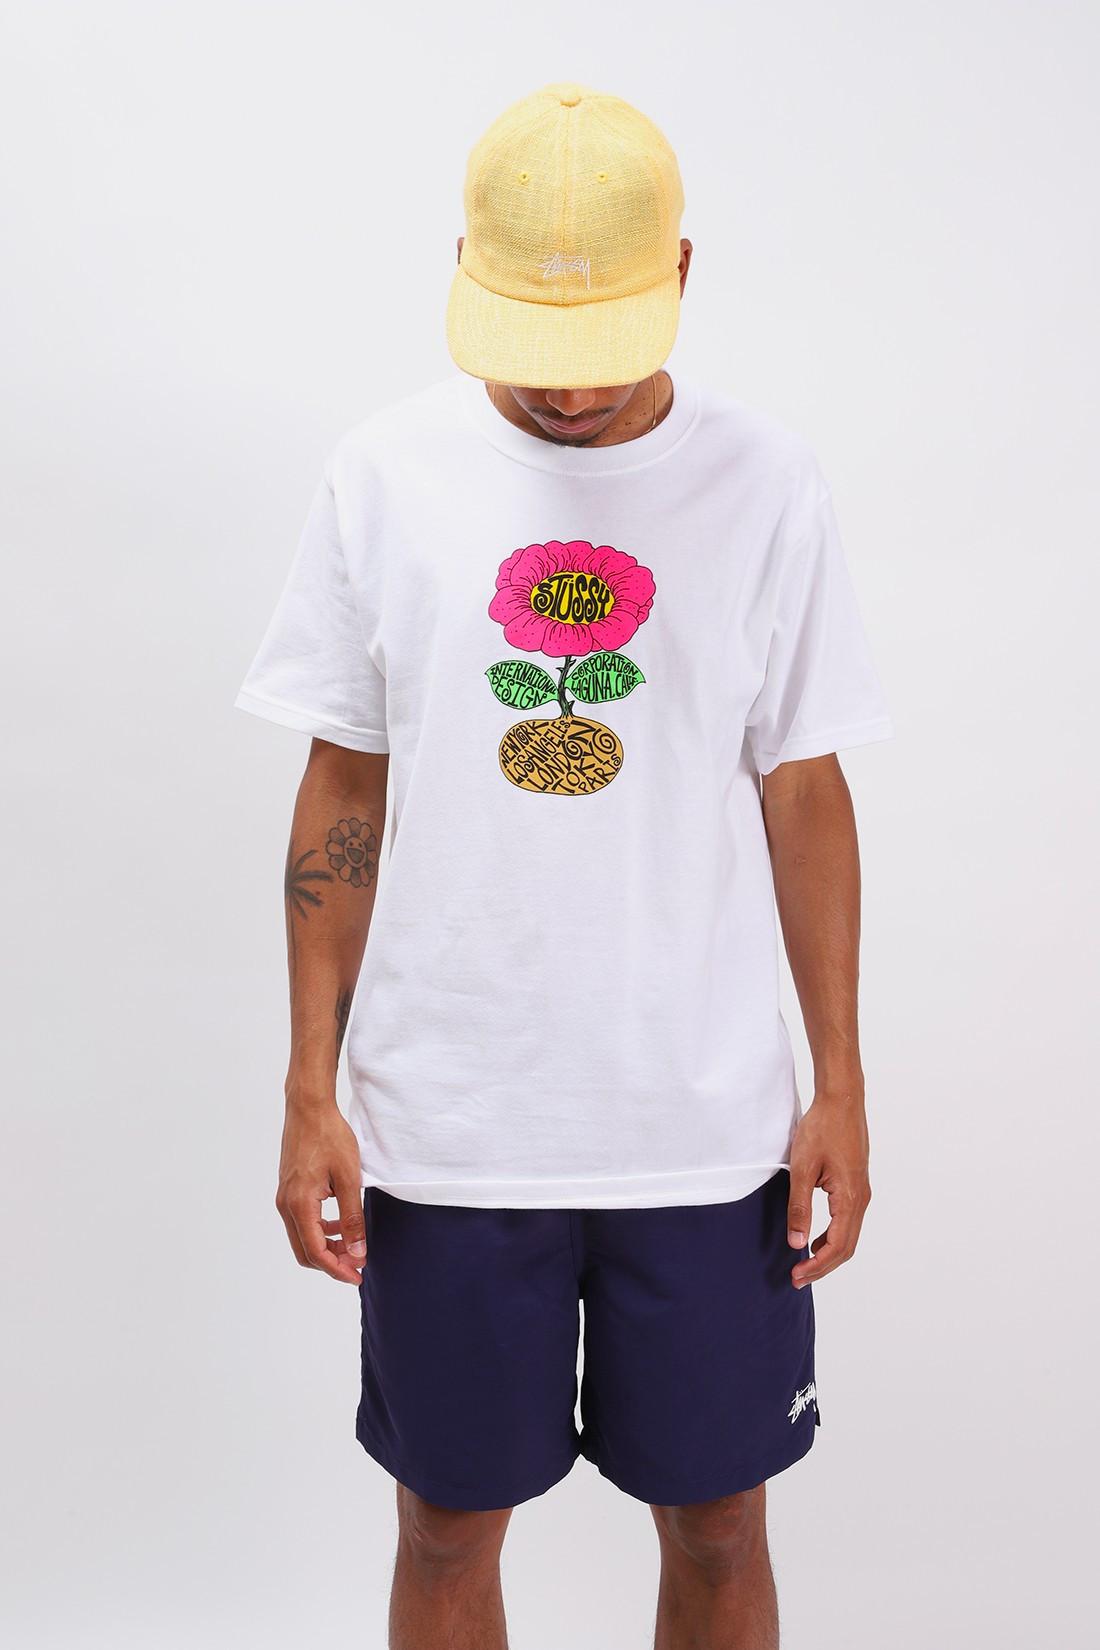 STUSSY / Sunflower tee White